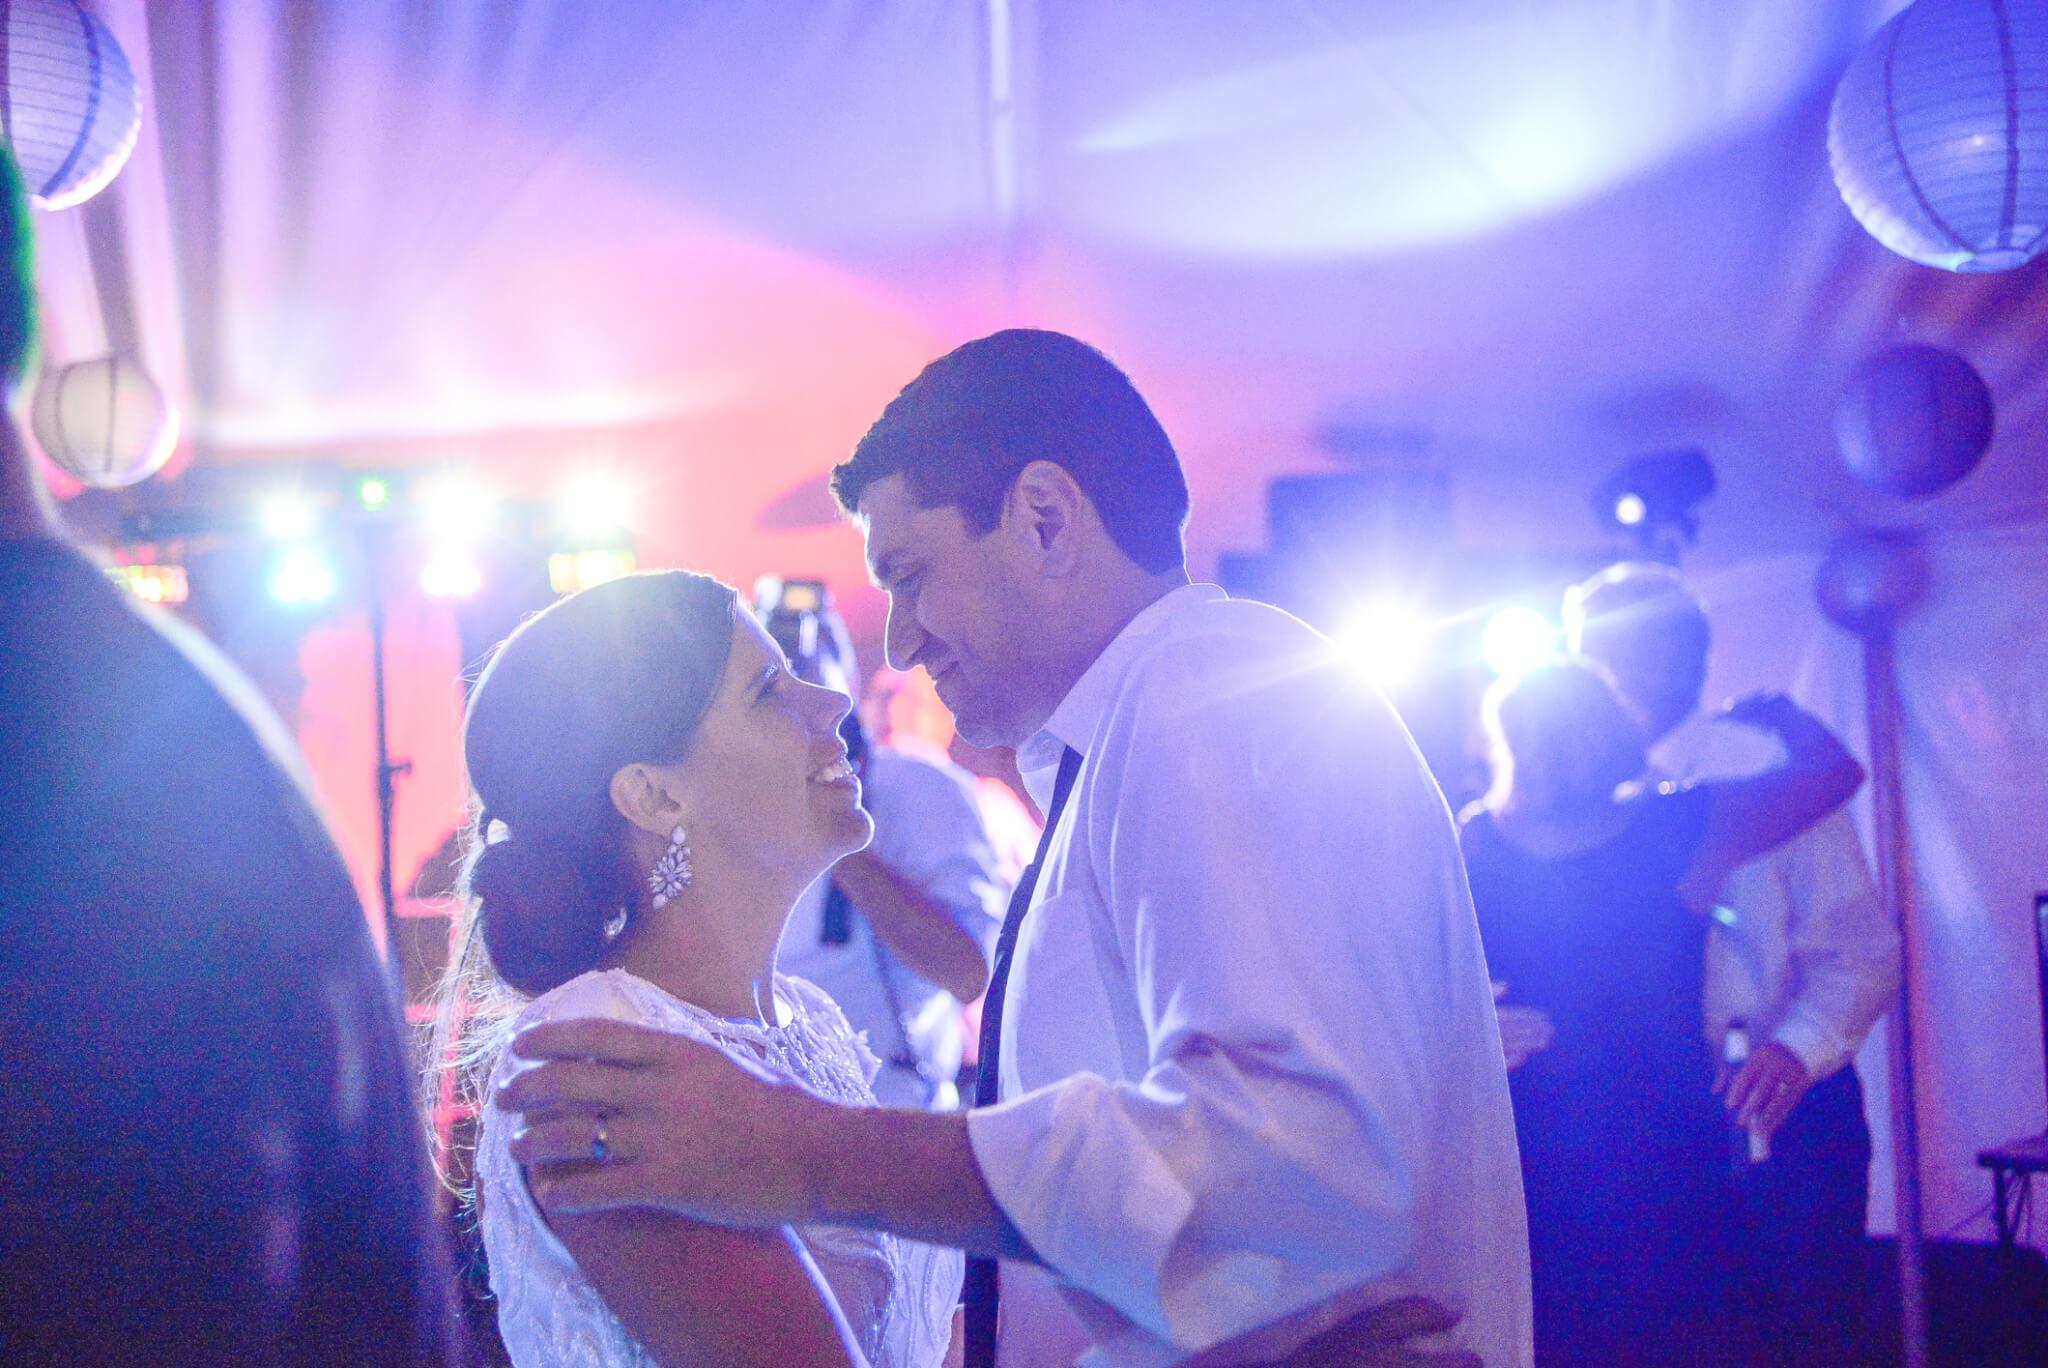 Could Dancing at Wedding